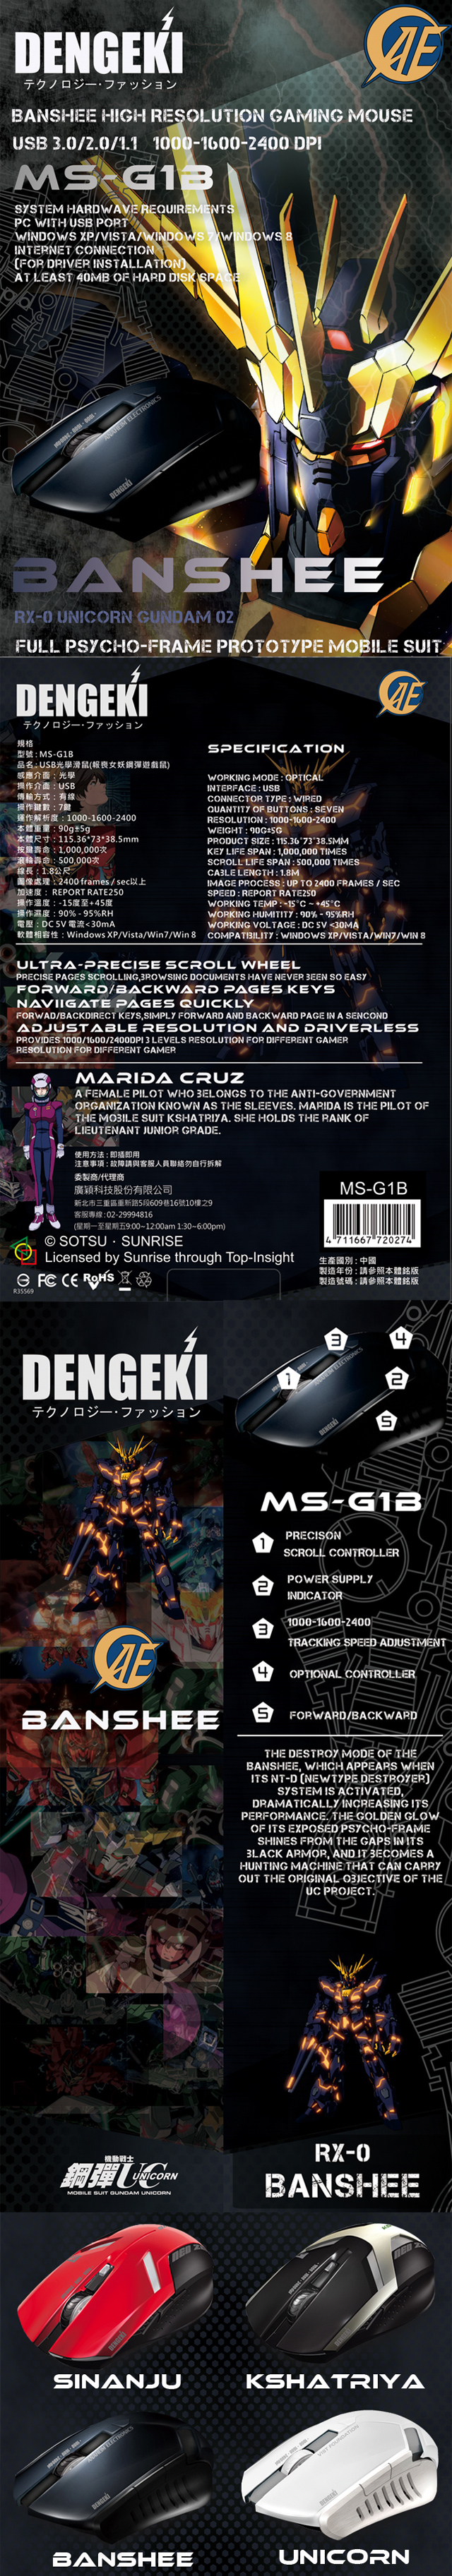 131206_gamelandvn_gundamgamingmouse04